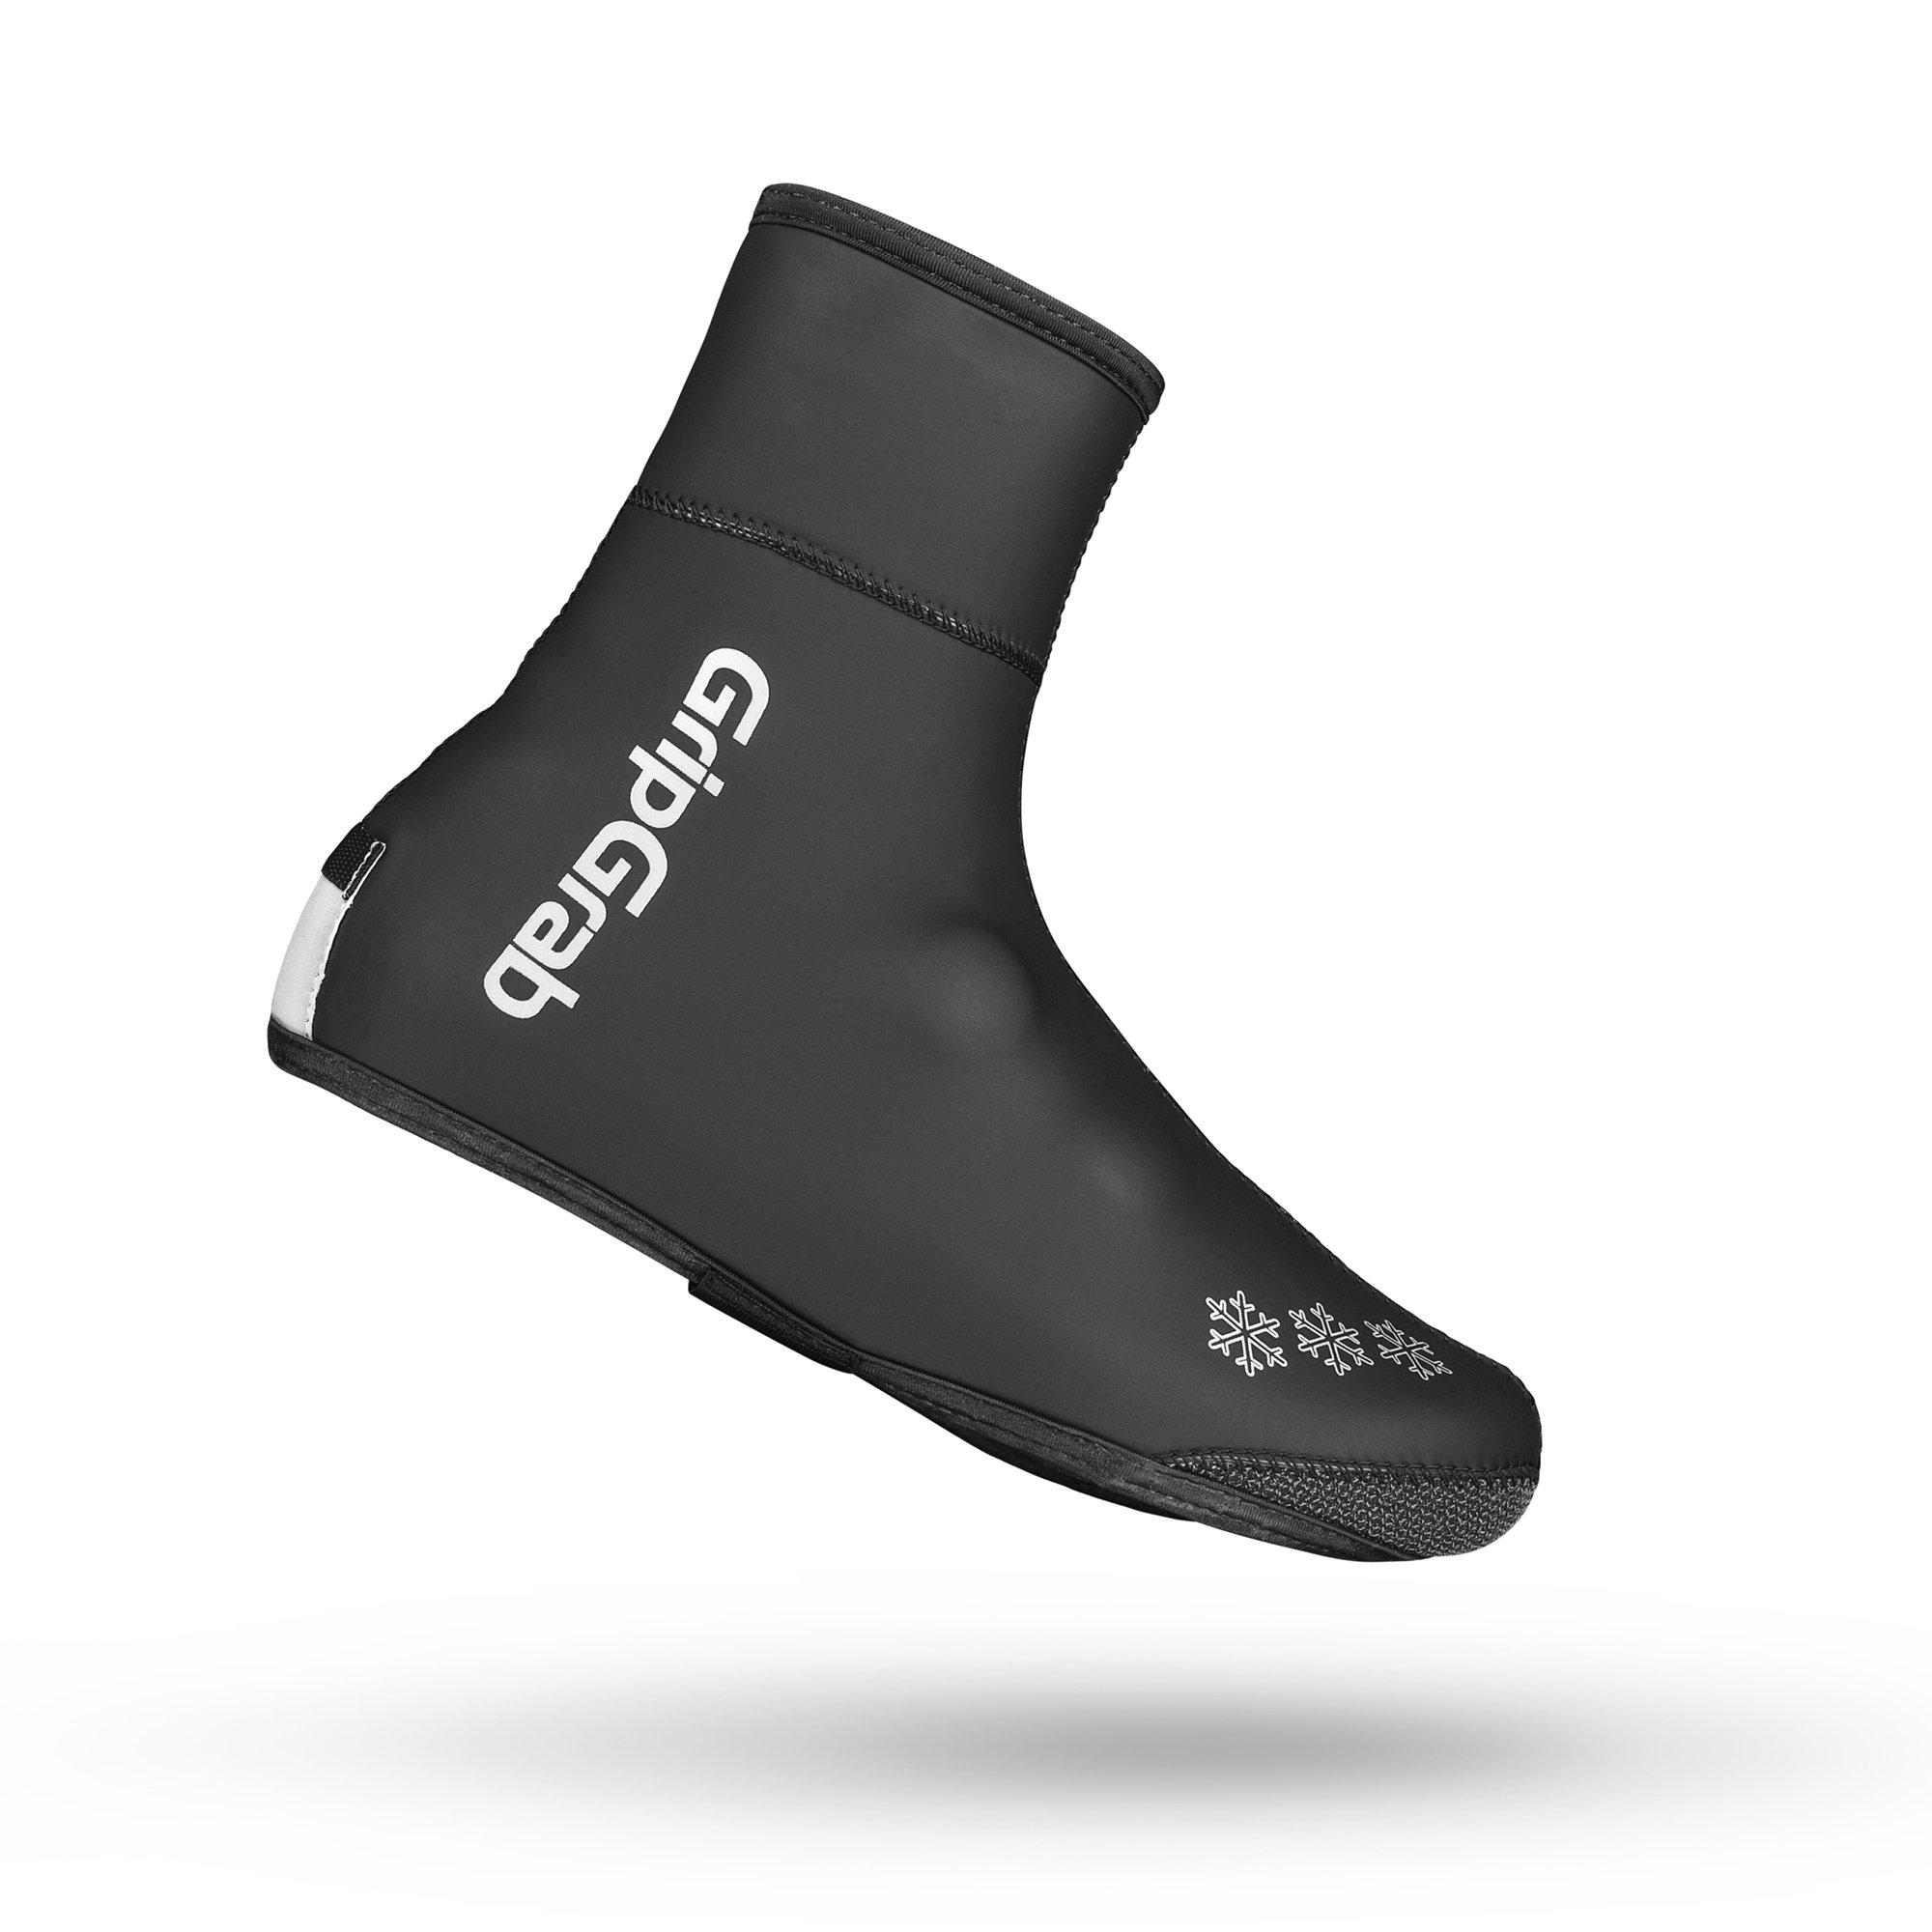 Grip Grab Arctic Waterproof Deep Winter Shoe Cover - Sur-chaussures vélo